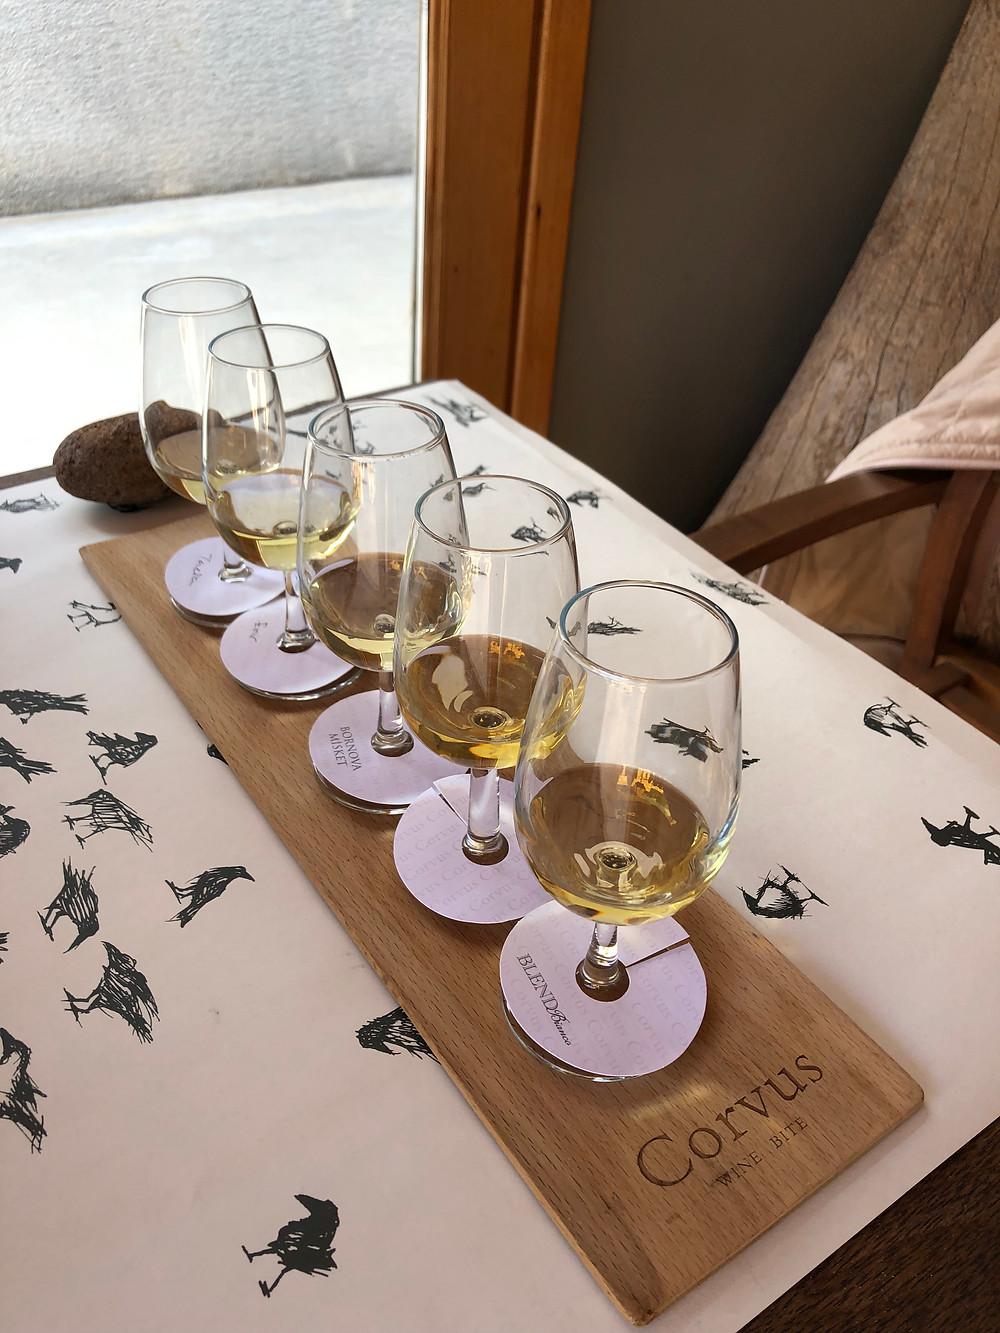 White wine tasting on Bozcaada island at Corvus winery and wine bar